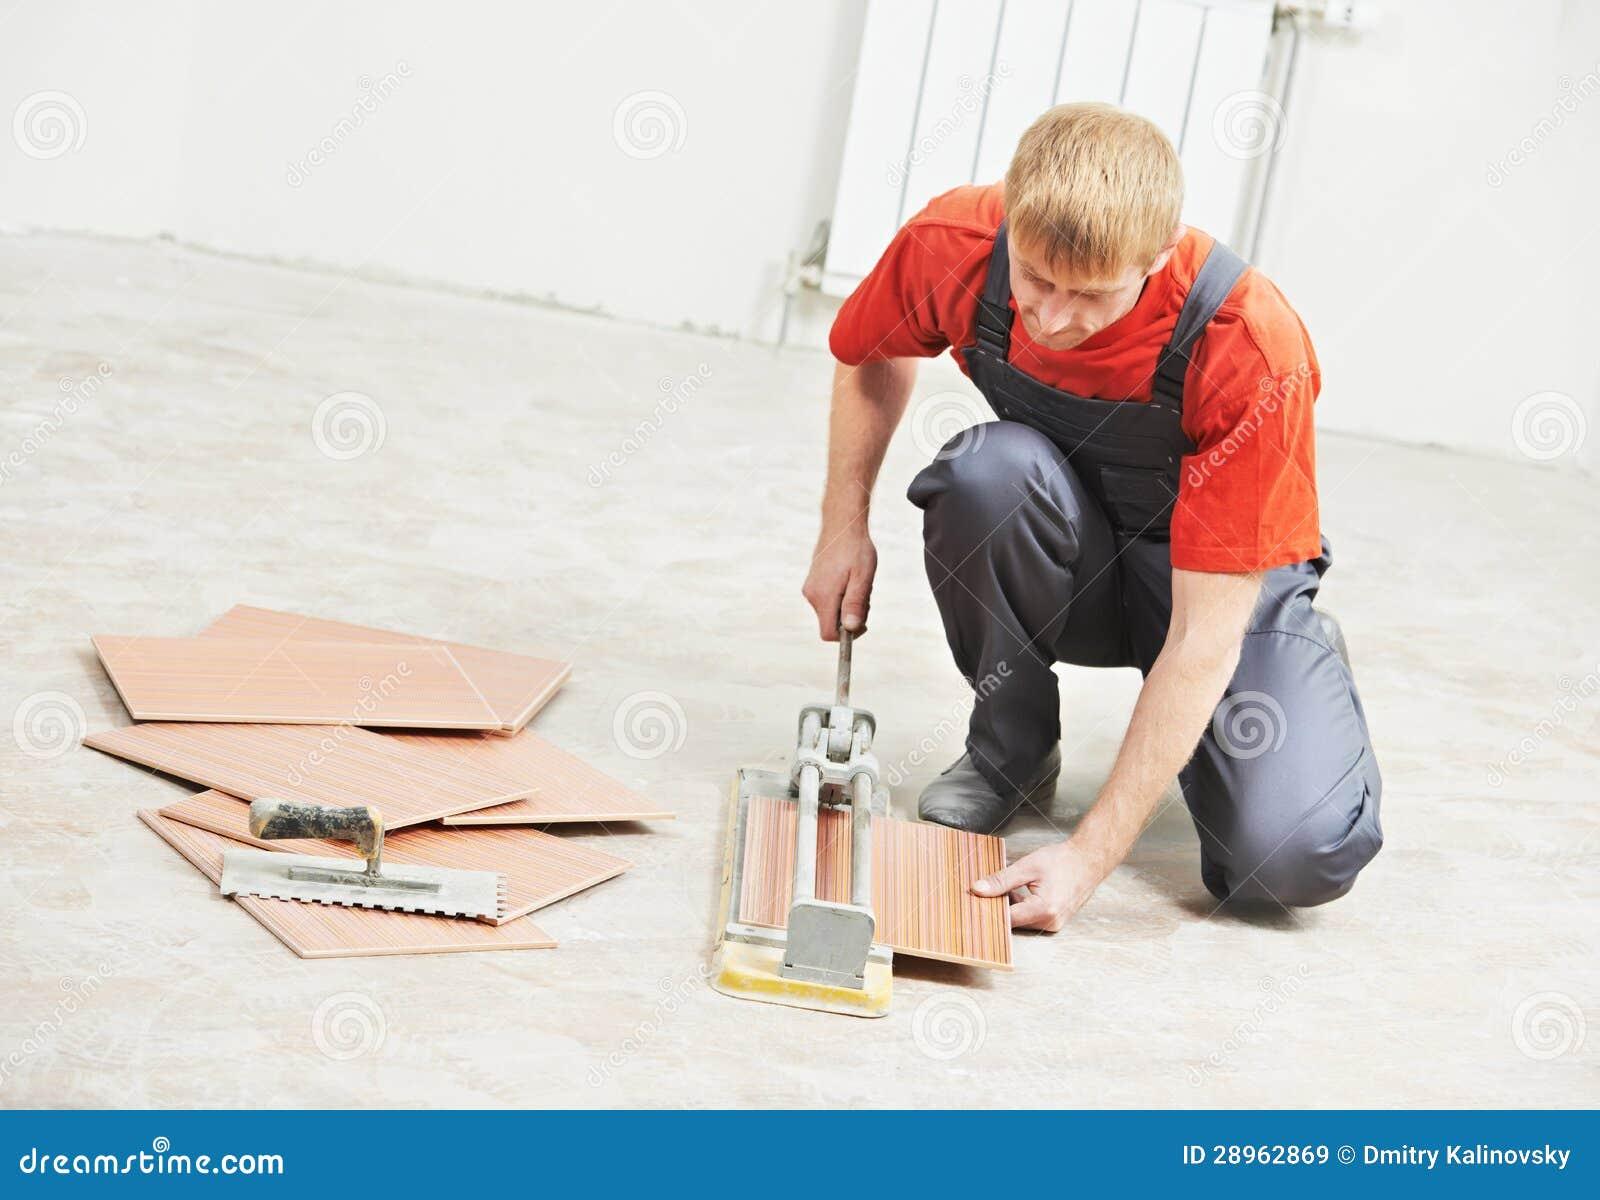 Tile Business Working : Tiler cutting tile at home renovation work royalty free